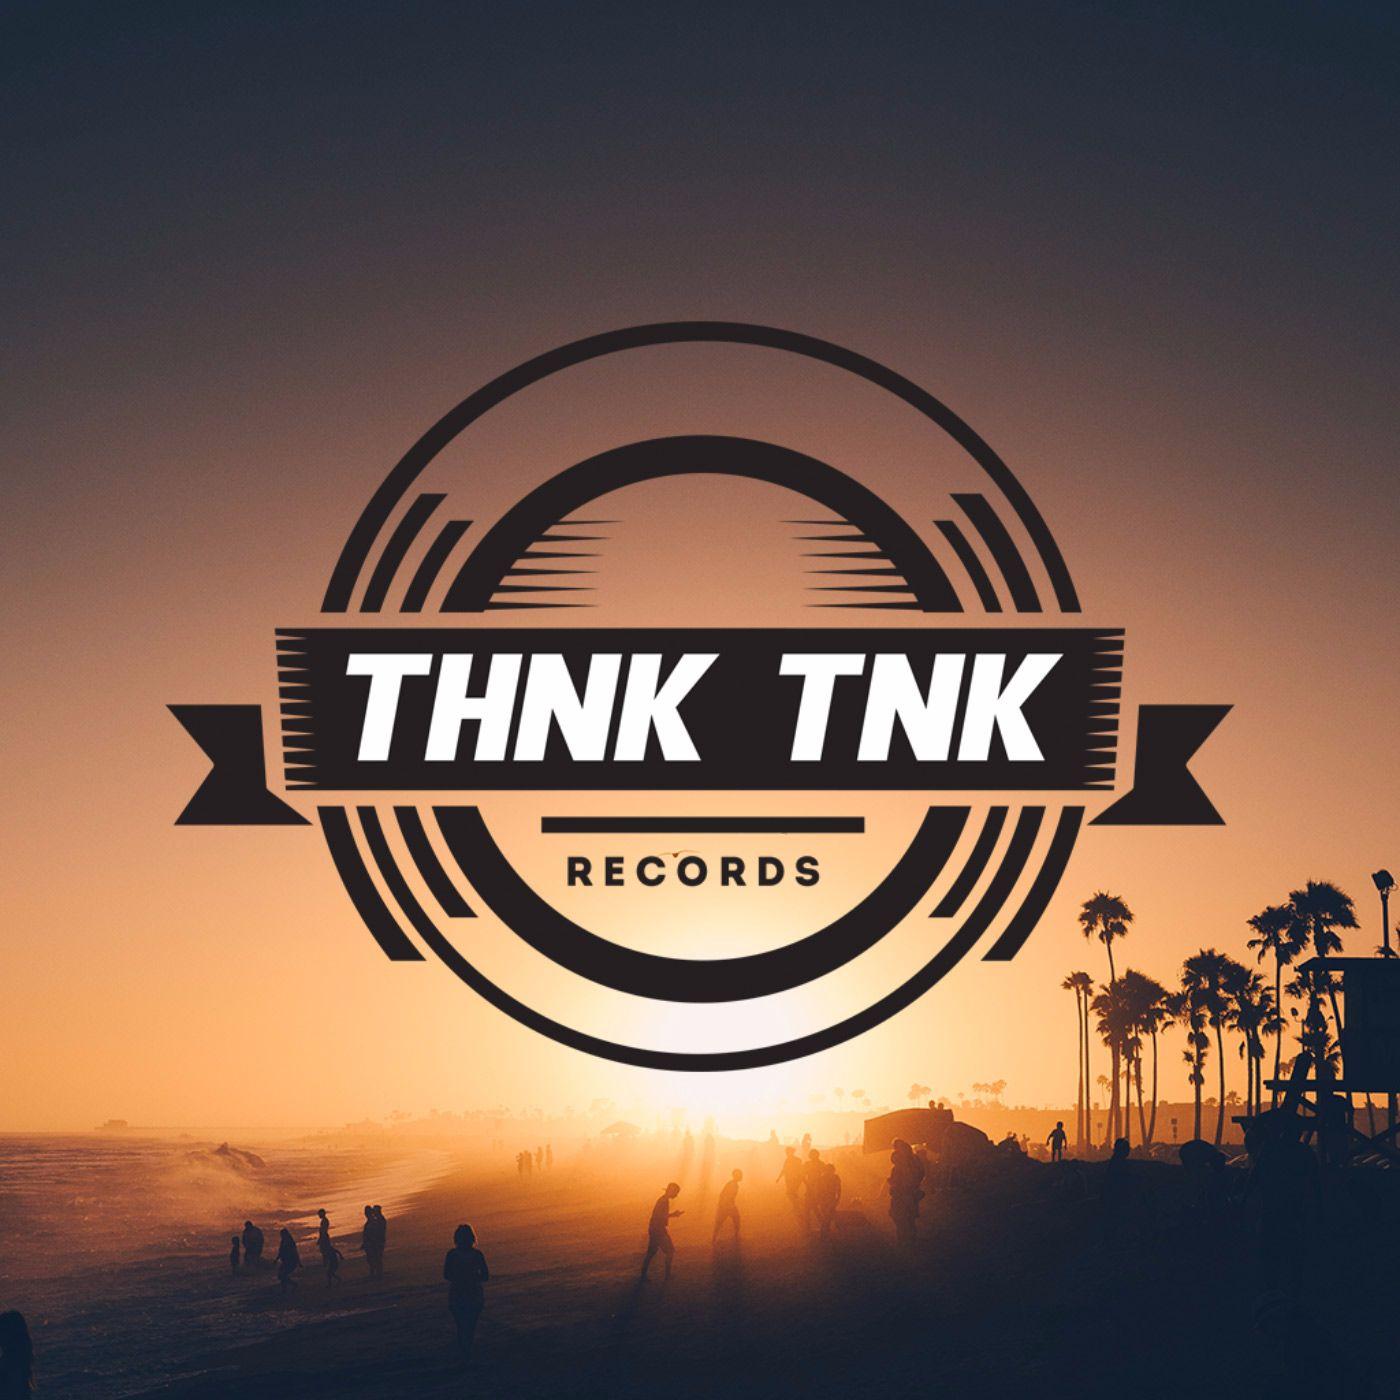 thnk-tnk